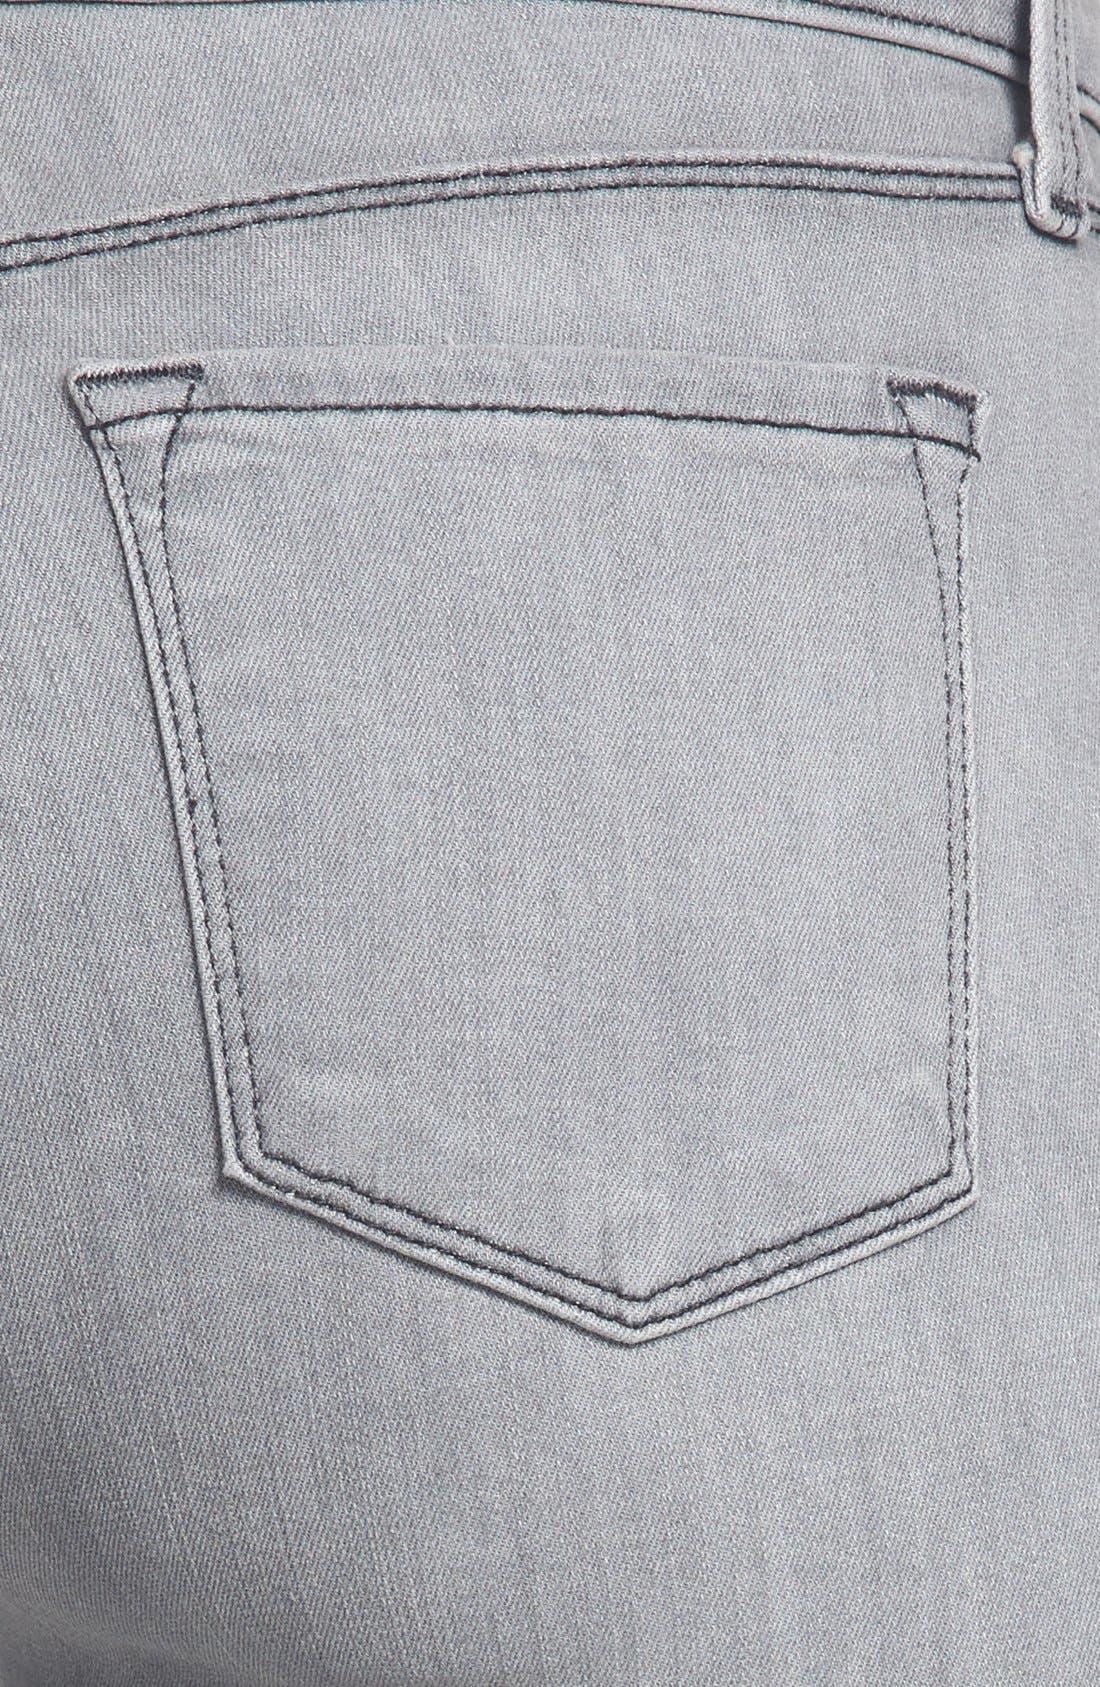 ,                             '620' Mid Rise Skinny Jeans,                             Alternate thumbnail 15, color,                             020